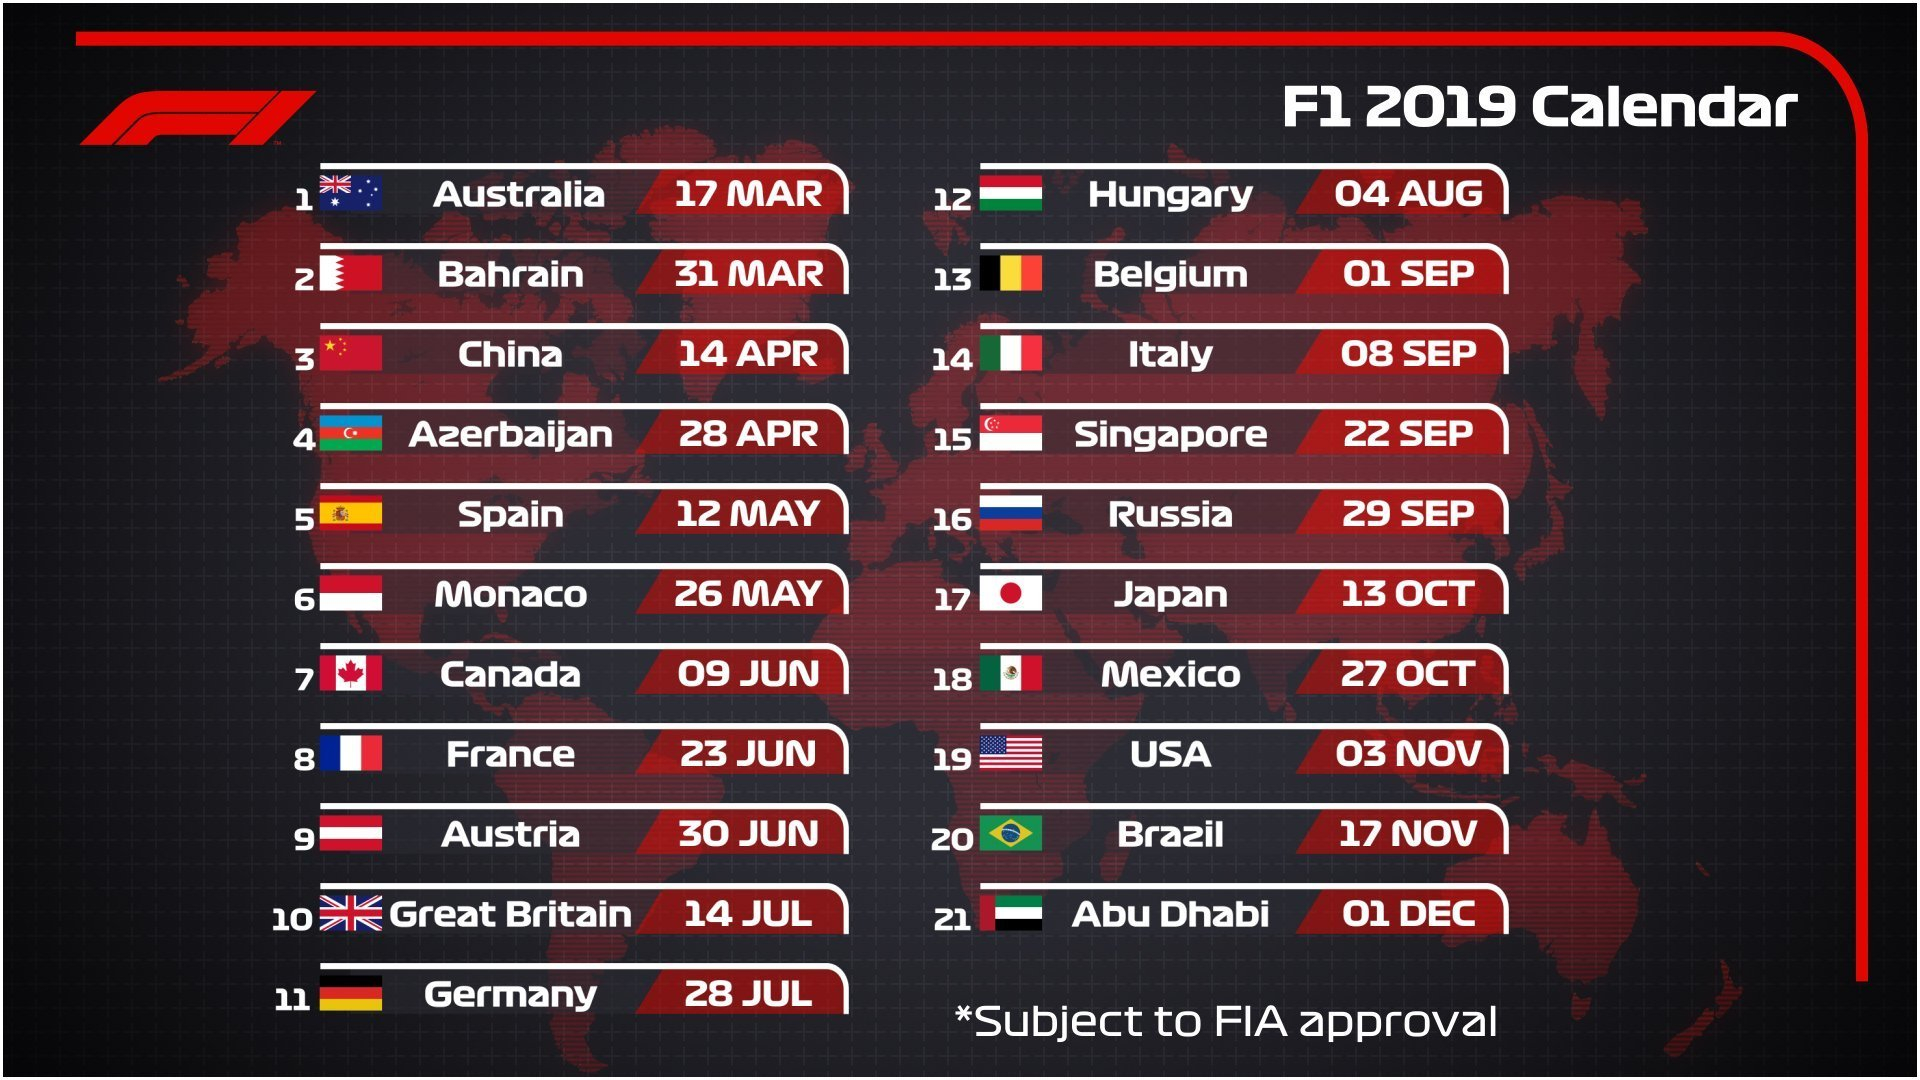 Formula 1 Calendar 2019 Google Calendar – Free Download Wallpaper Formula 1 Calendar 2019 Ical